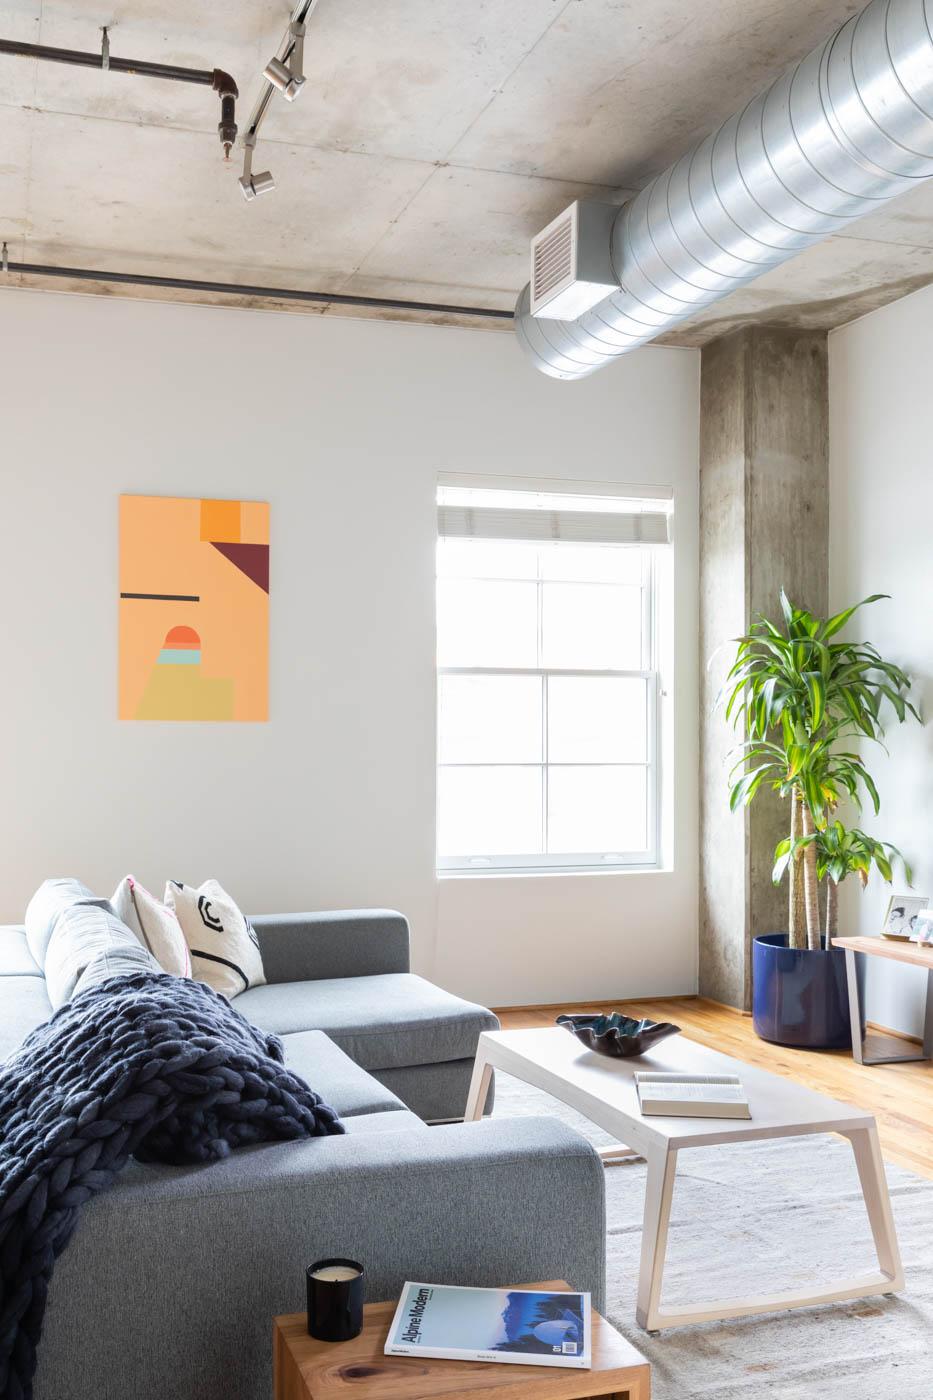 ArtistLoft-DenverCO-natural-light-photography-studio-lifestyle-photoshoot-location-editorial-commercial-photography-16.jpg